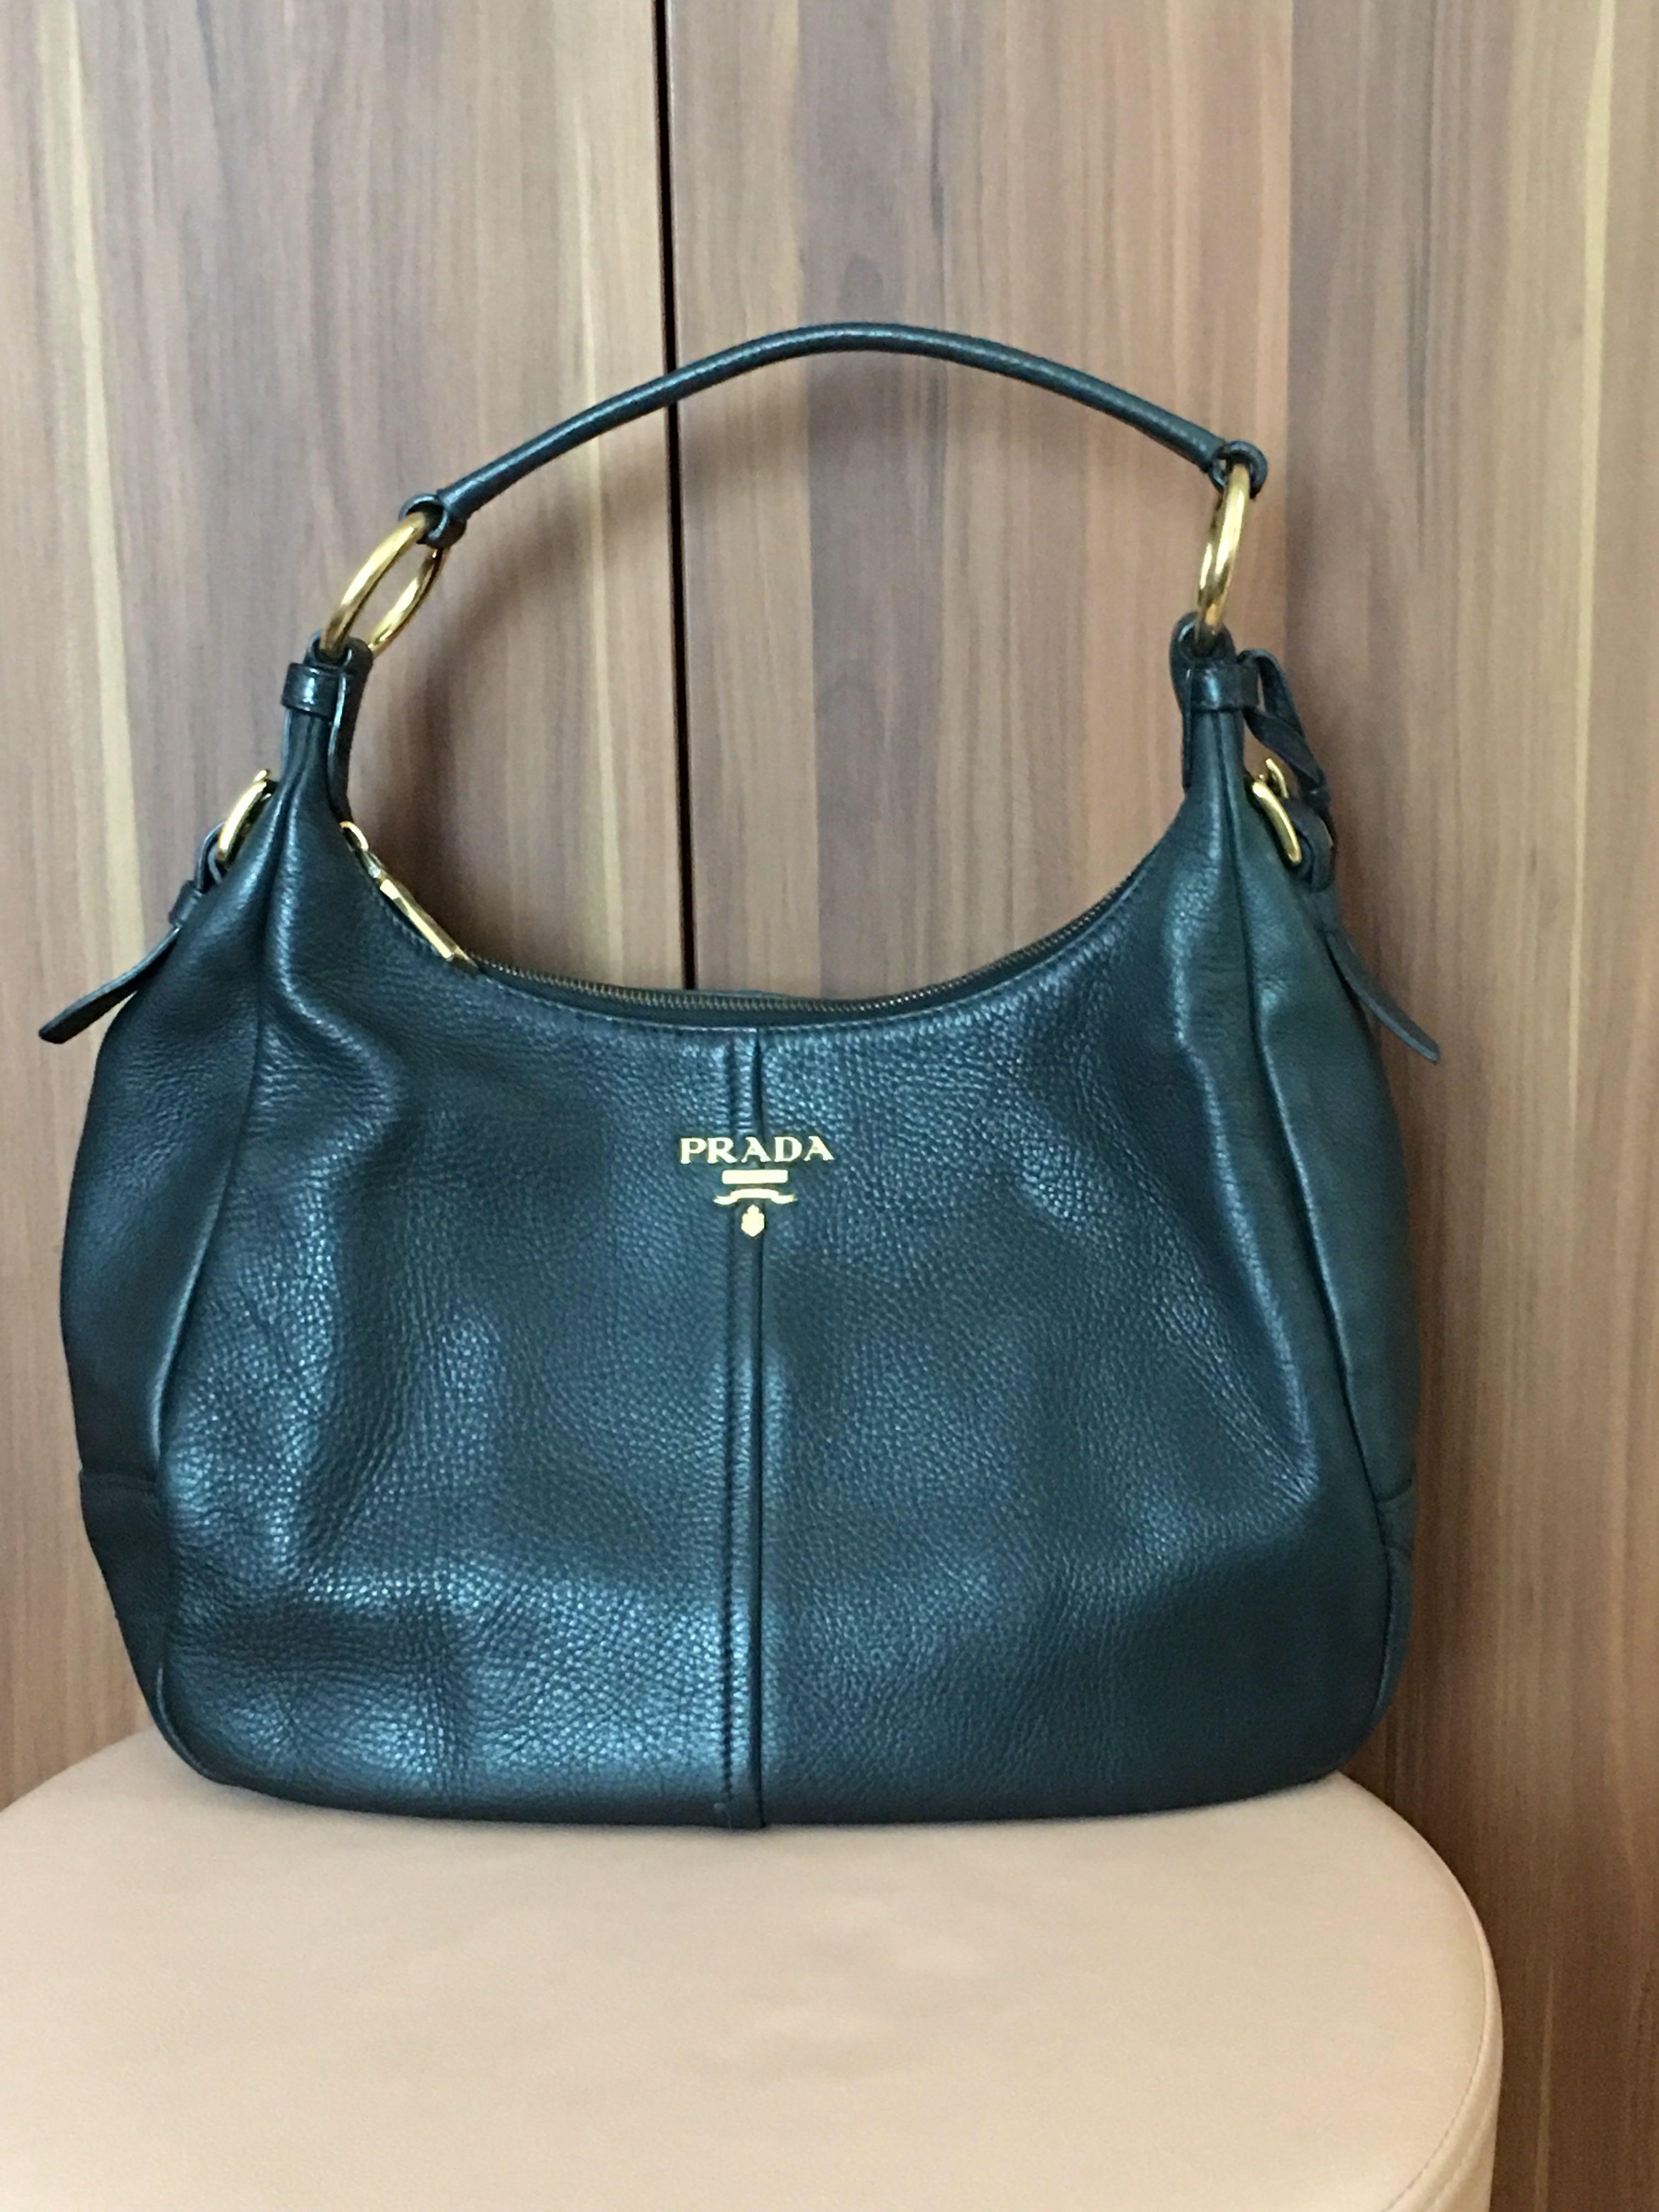 0d274fb2aee Prada Hobo Bag - Authentic